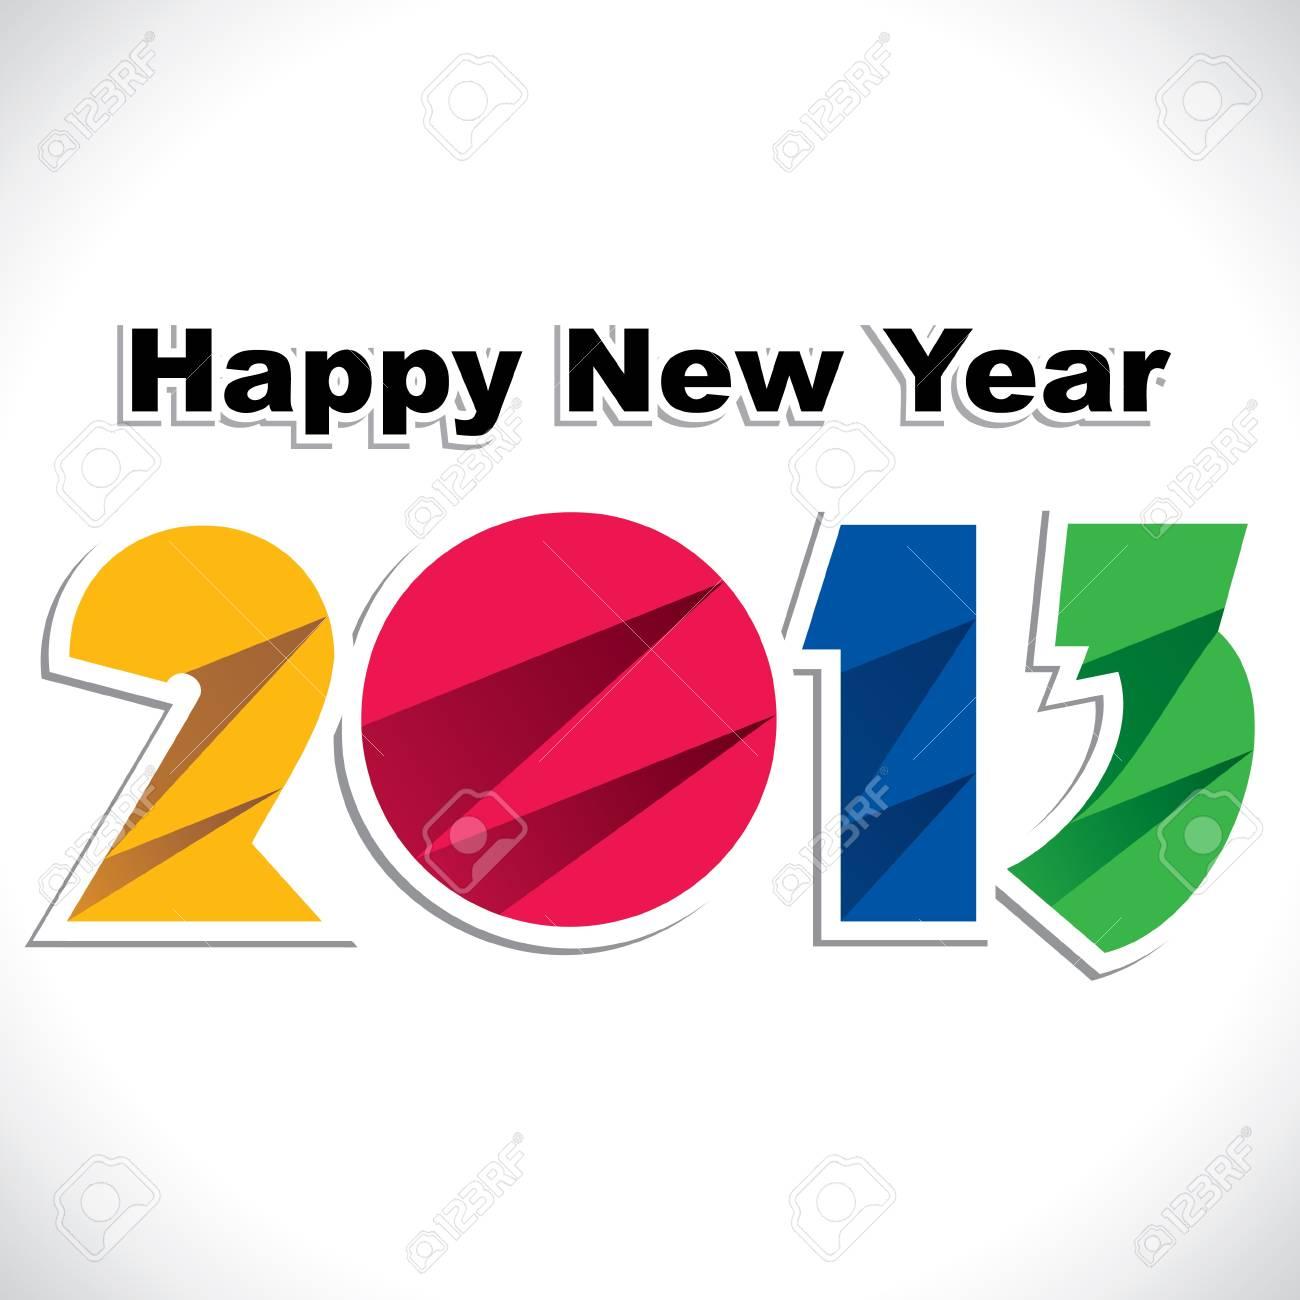 creative writing of new year 2013 Stock Vector - 16845726